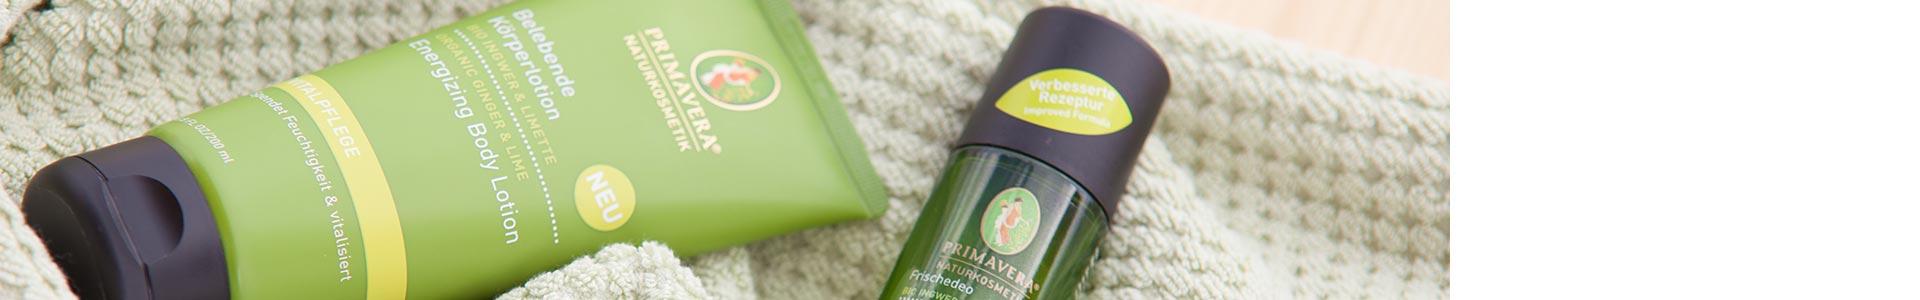 PRIMAVERA Vitalpflege Bio Ingwer & Limette